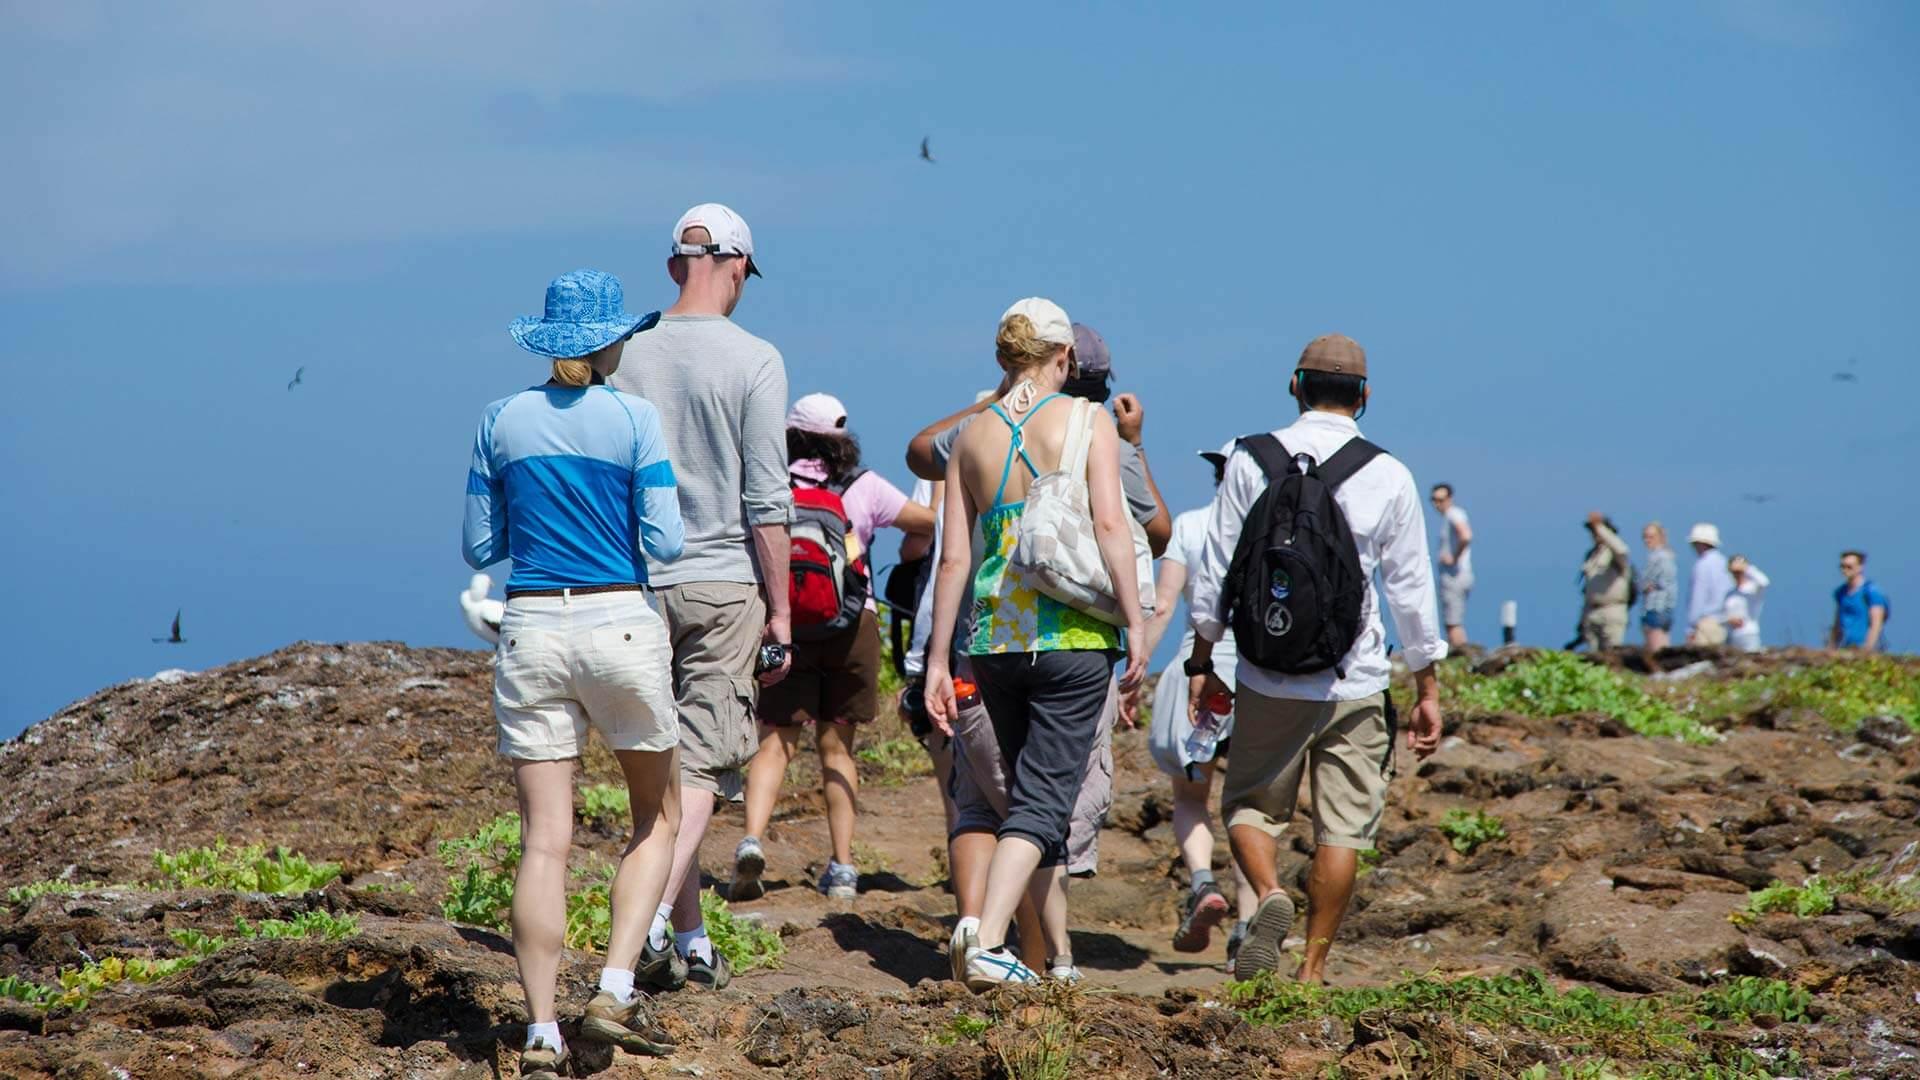 galapagos island hopping tourists walking in group